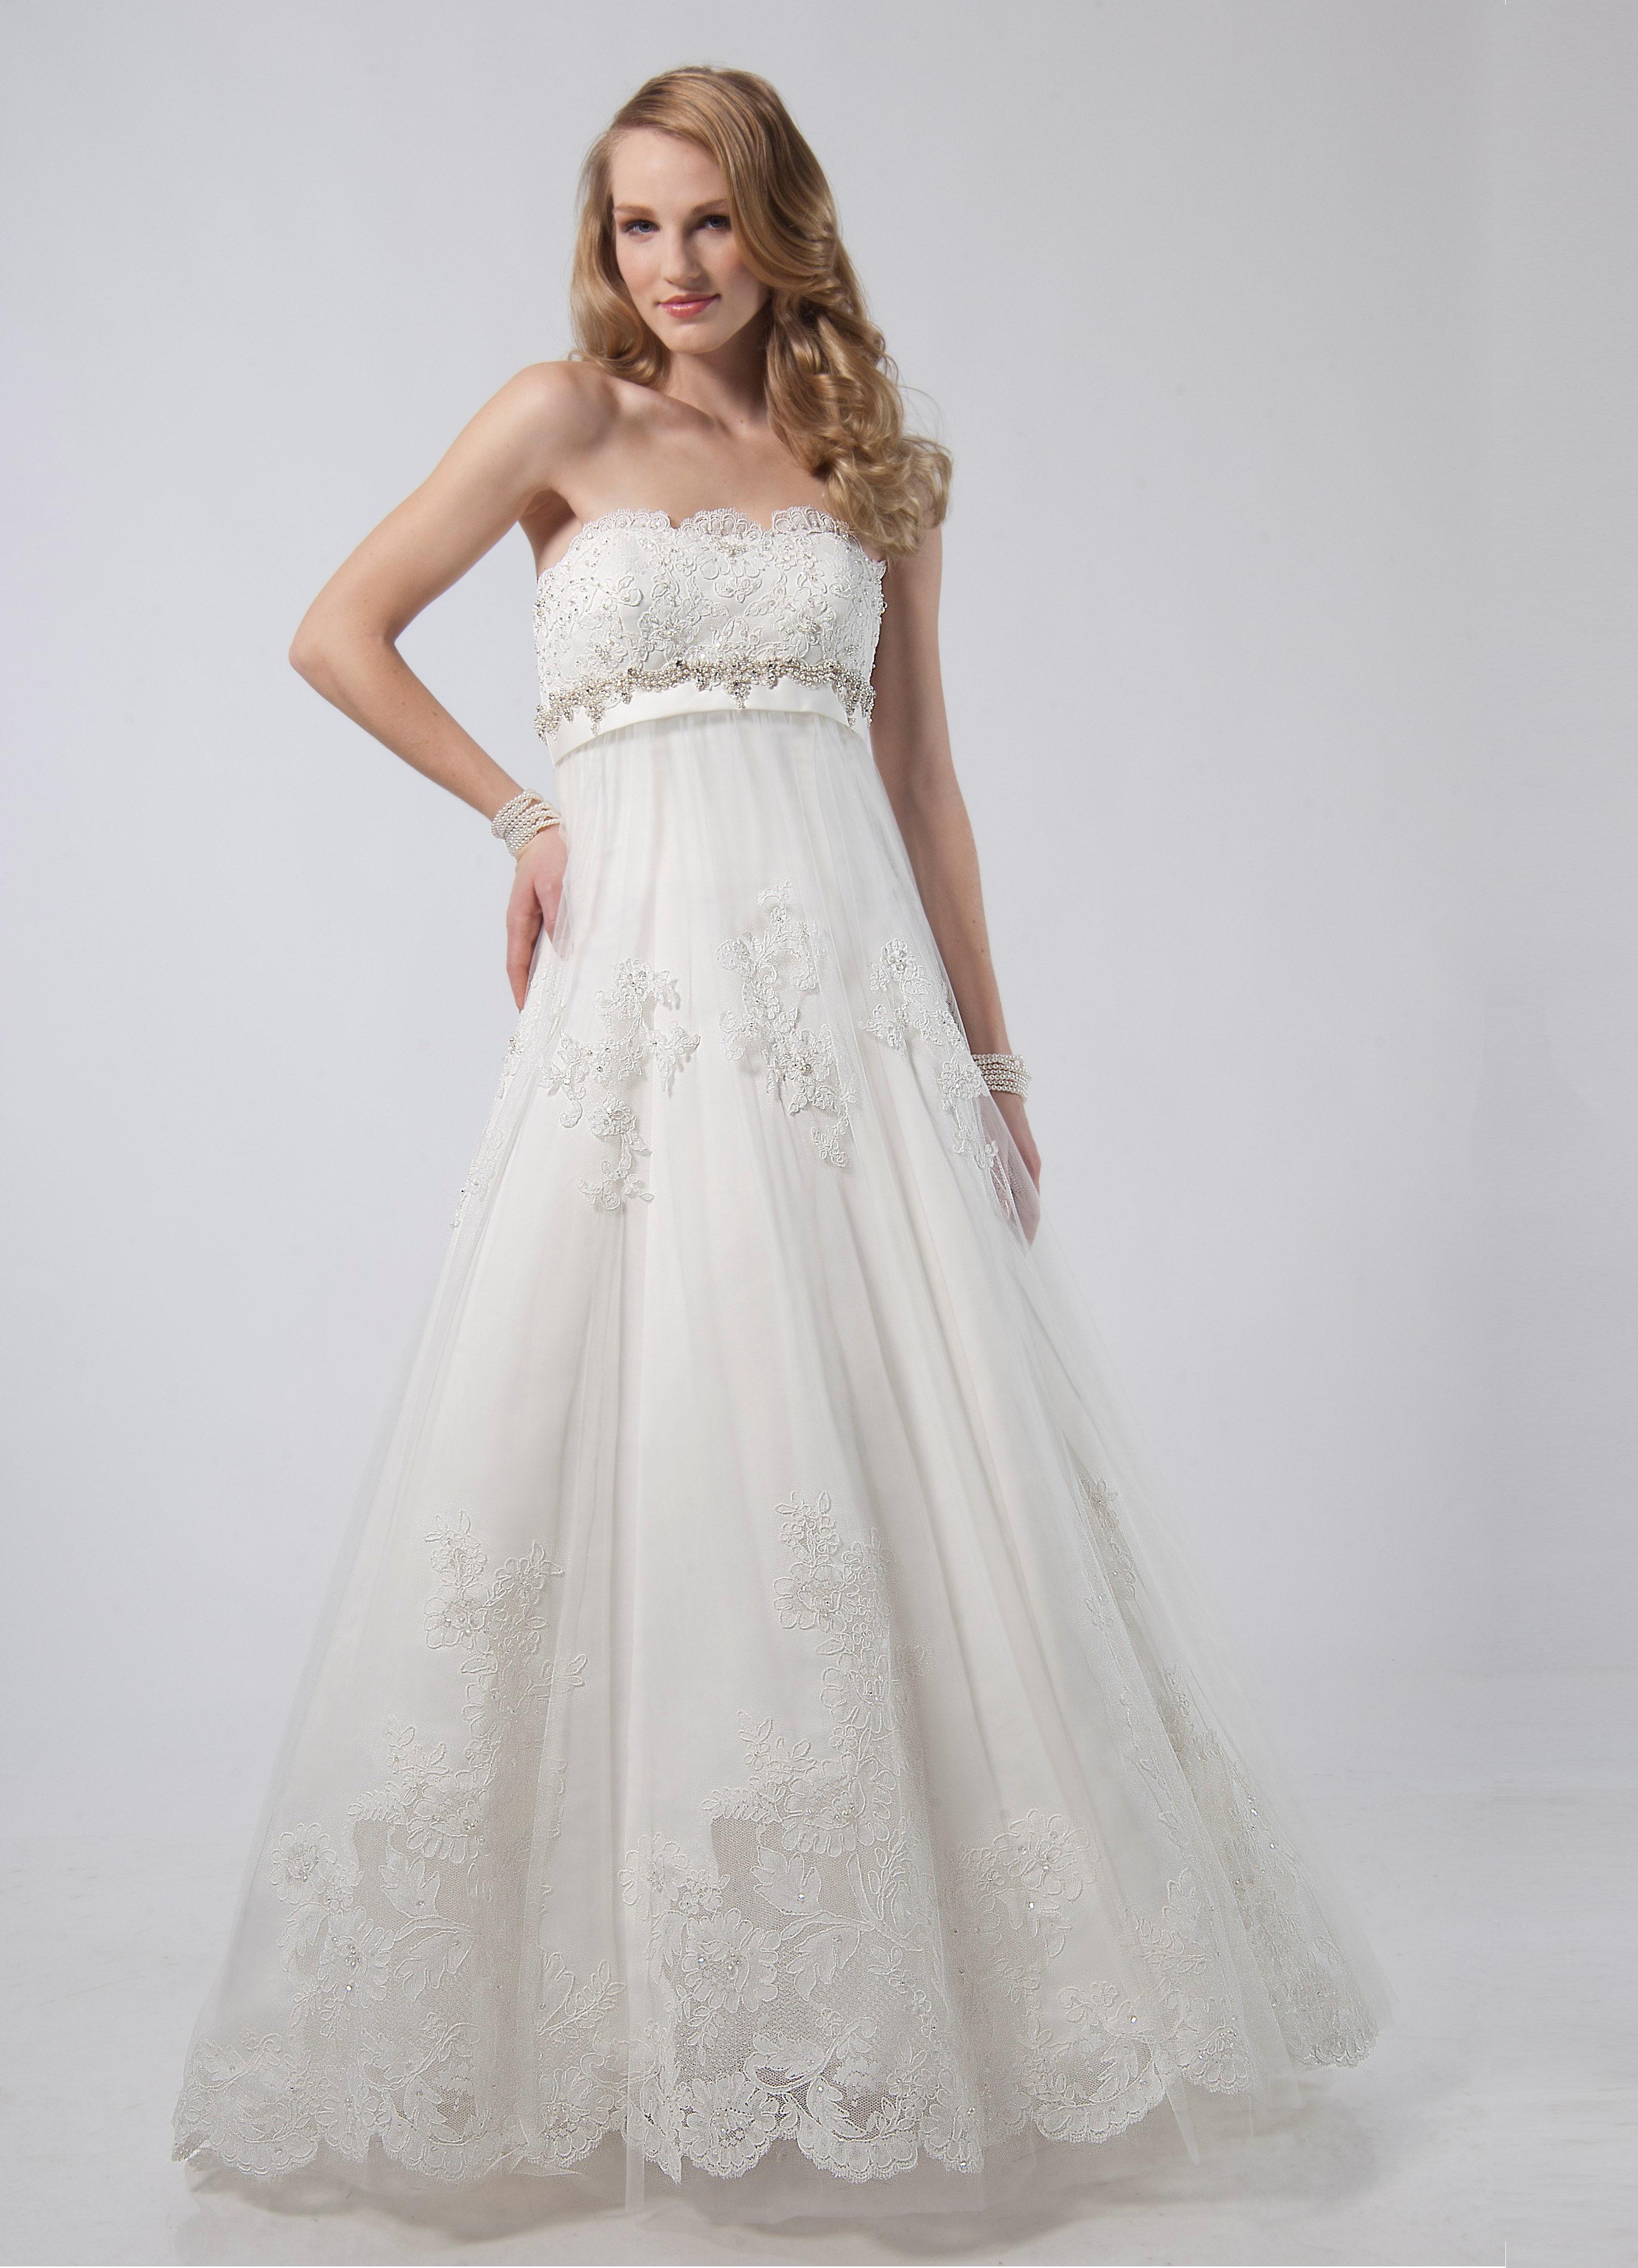 ... Свадебные платья для беременных на 5 месяце18 01285ffd50c